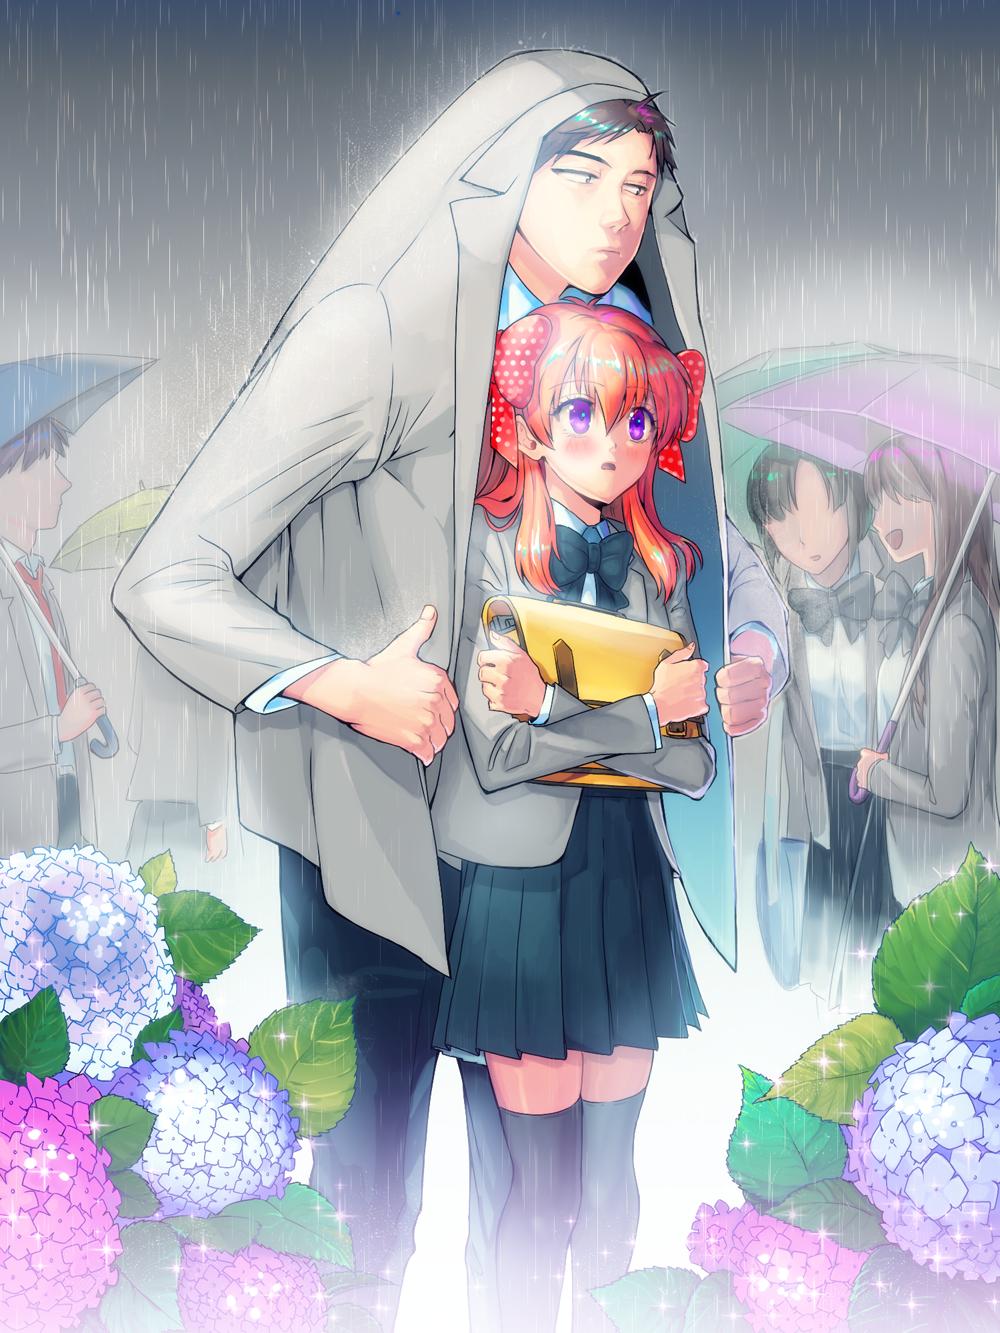 in the rain linebj [pixiv] sakura chiyo & nozaki